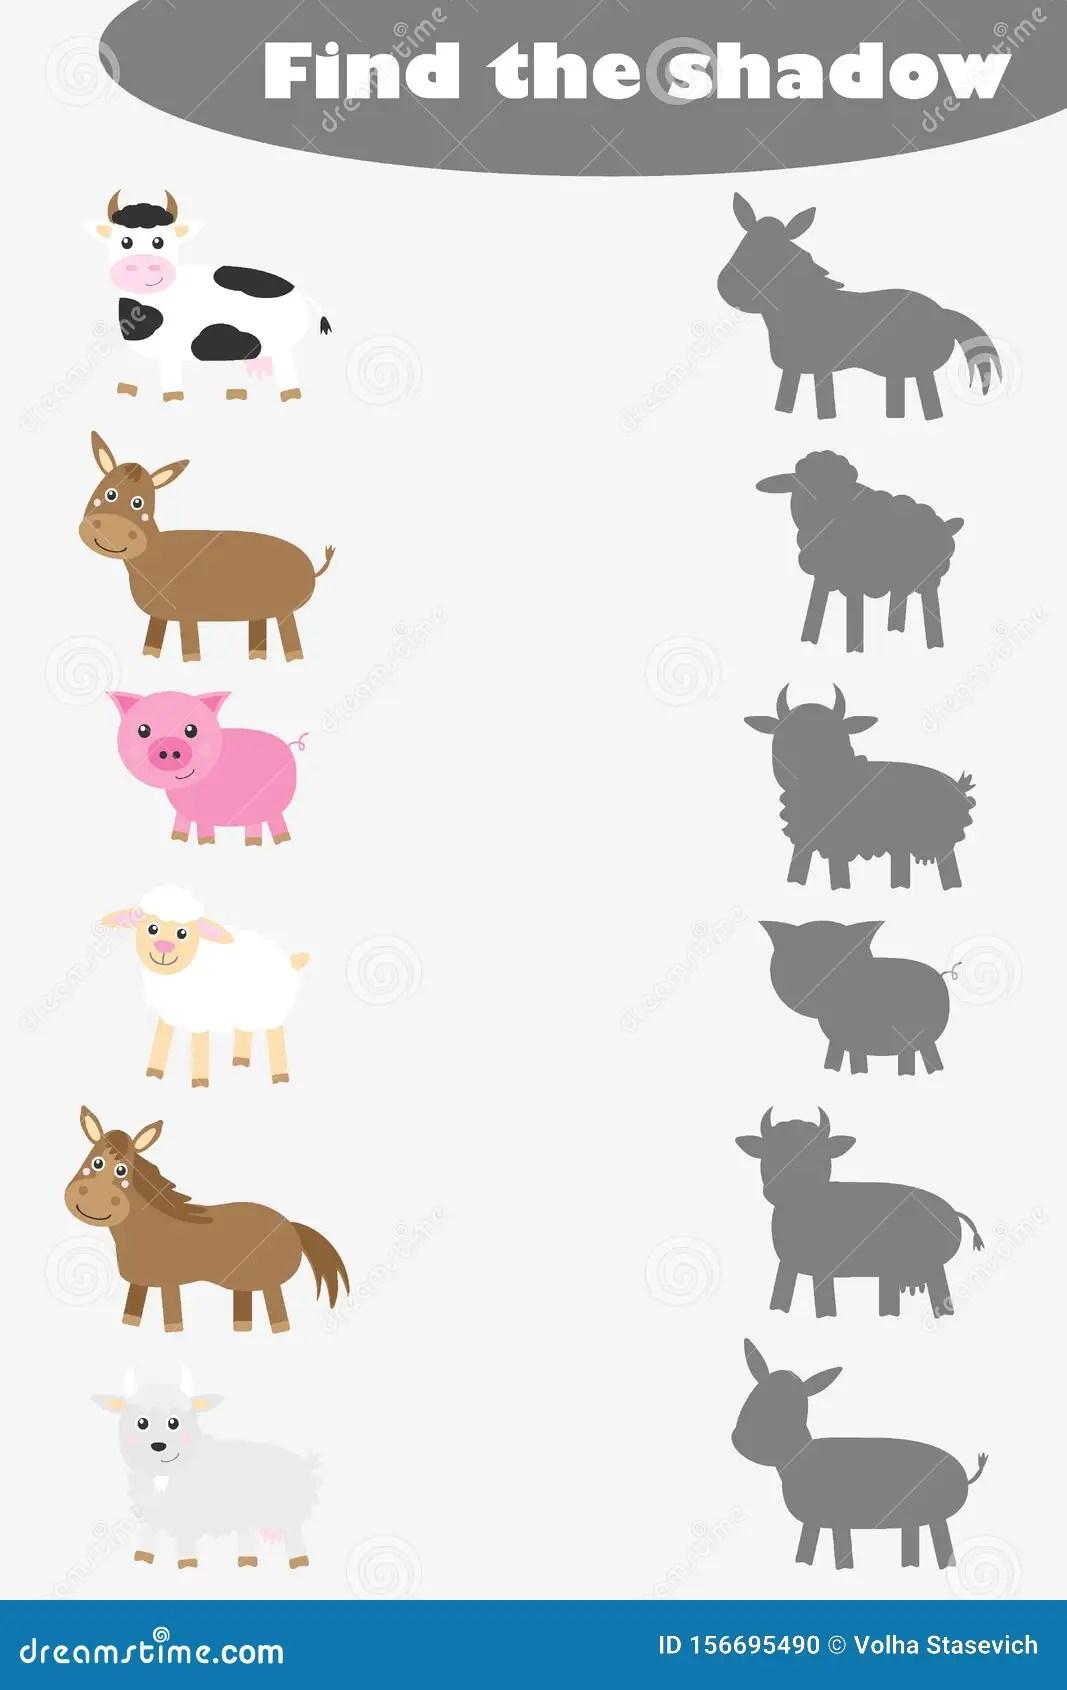 Find The Shadow Game For Children Farm Animals In Cartoon